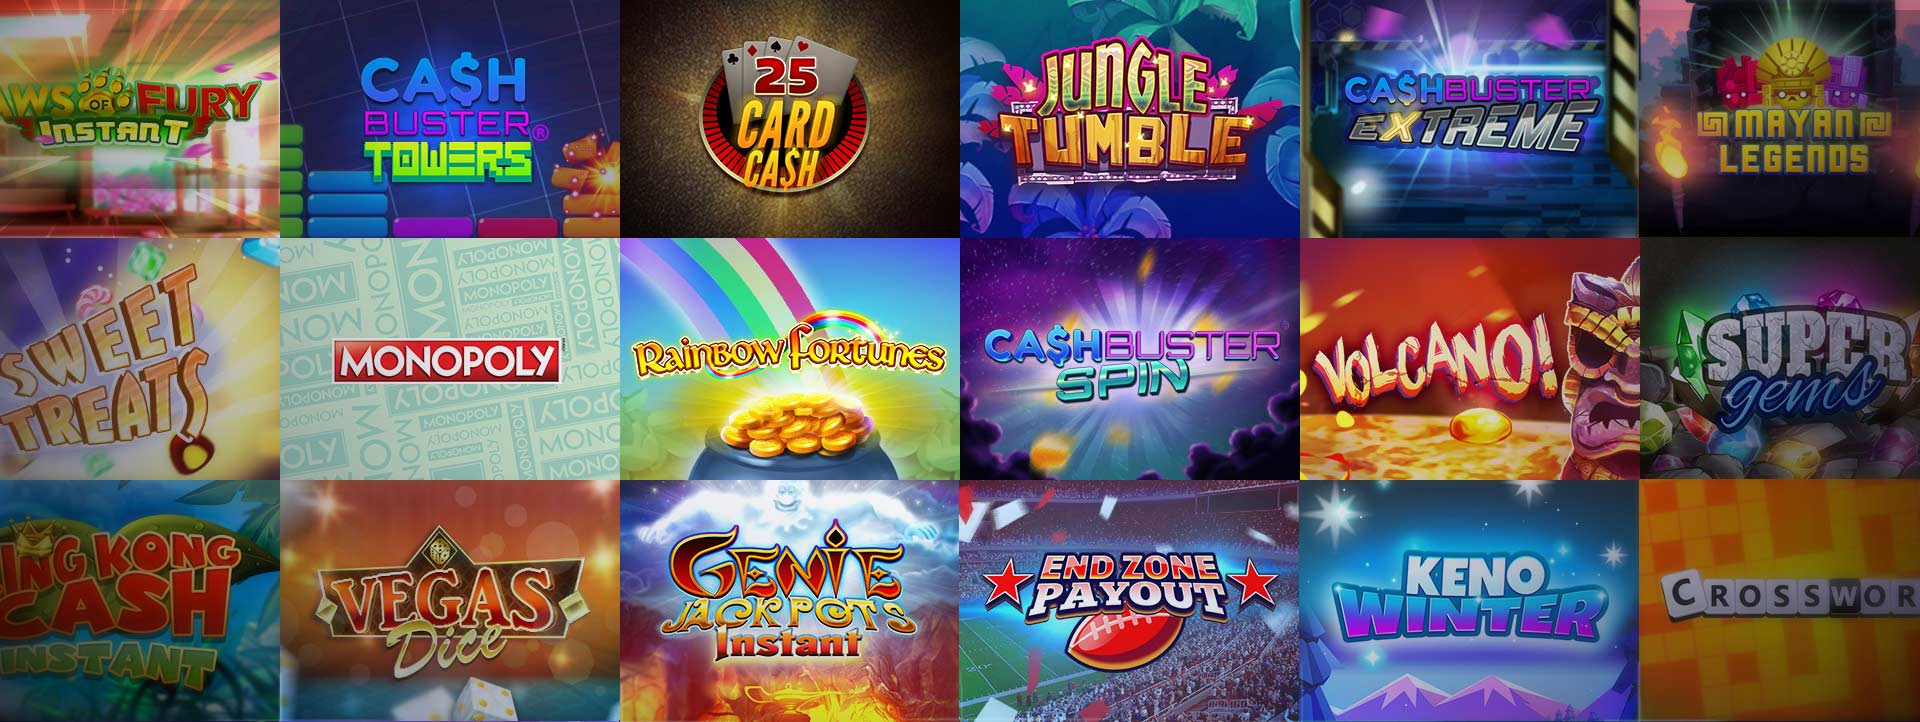 IWG Games Software Screen Shot